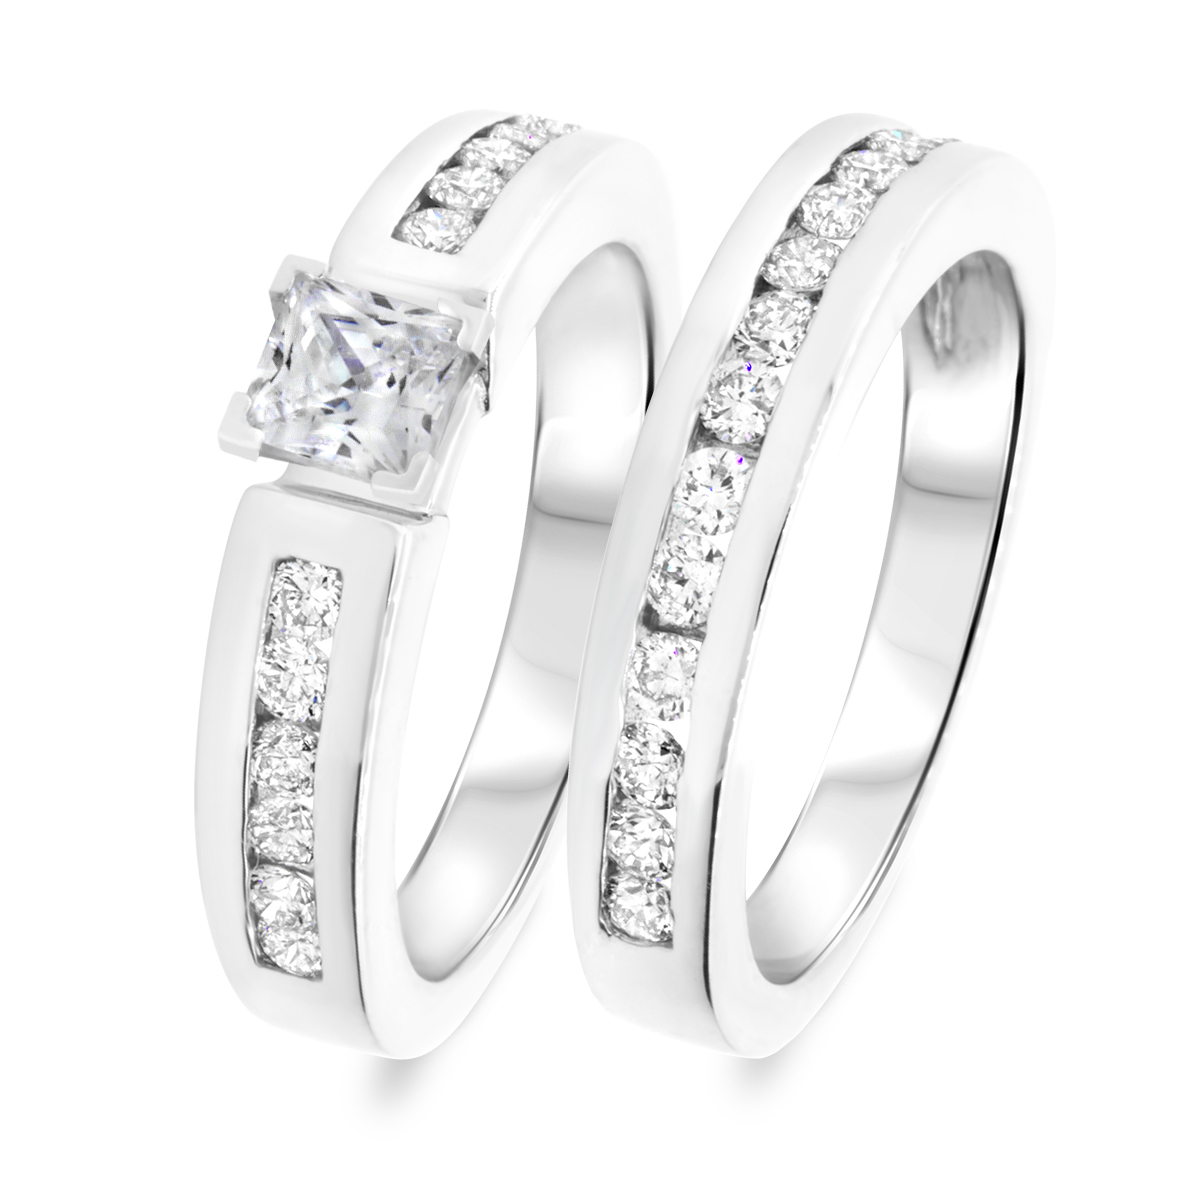 1 3/8 CT. T.W. Diamond Women's Bridal Wedding Ring Set 10K White Gold